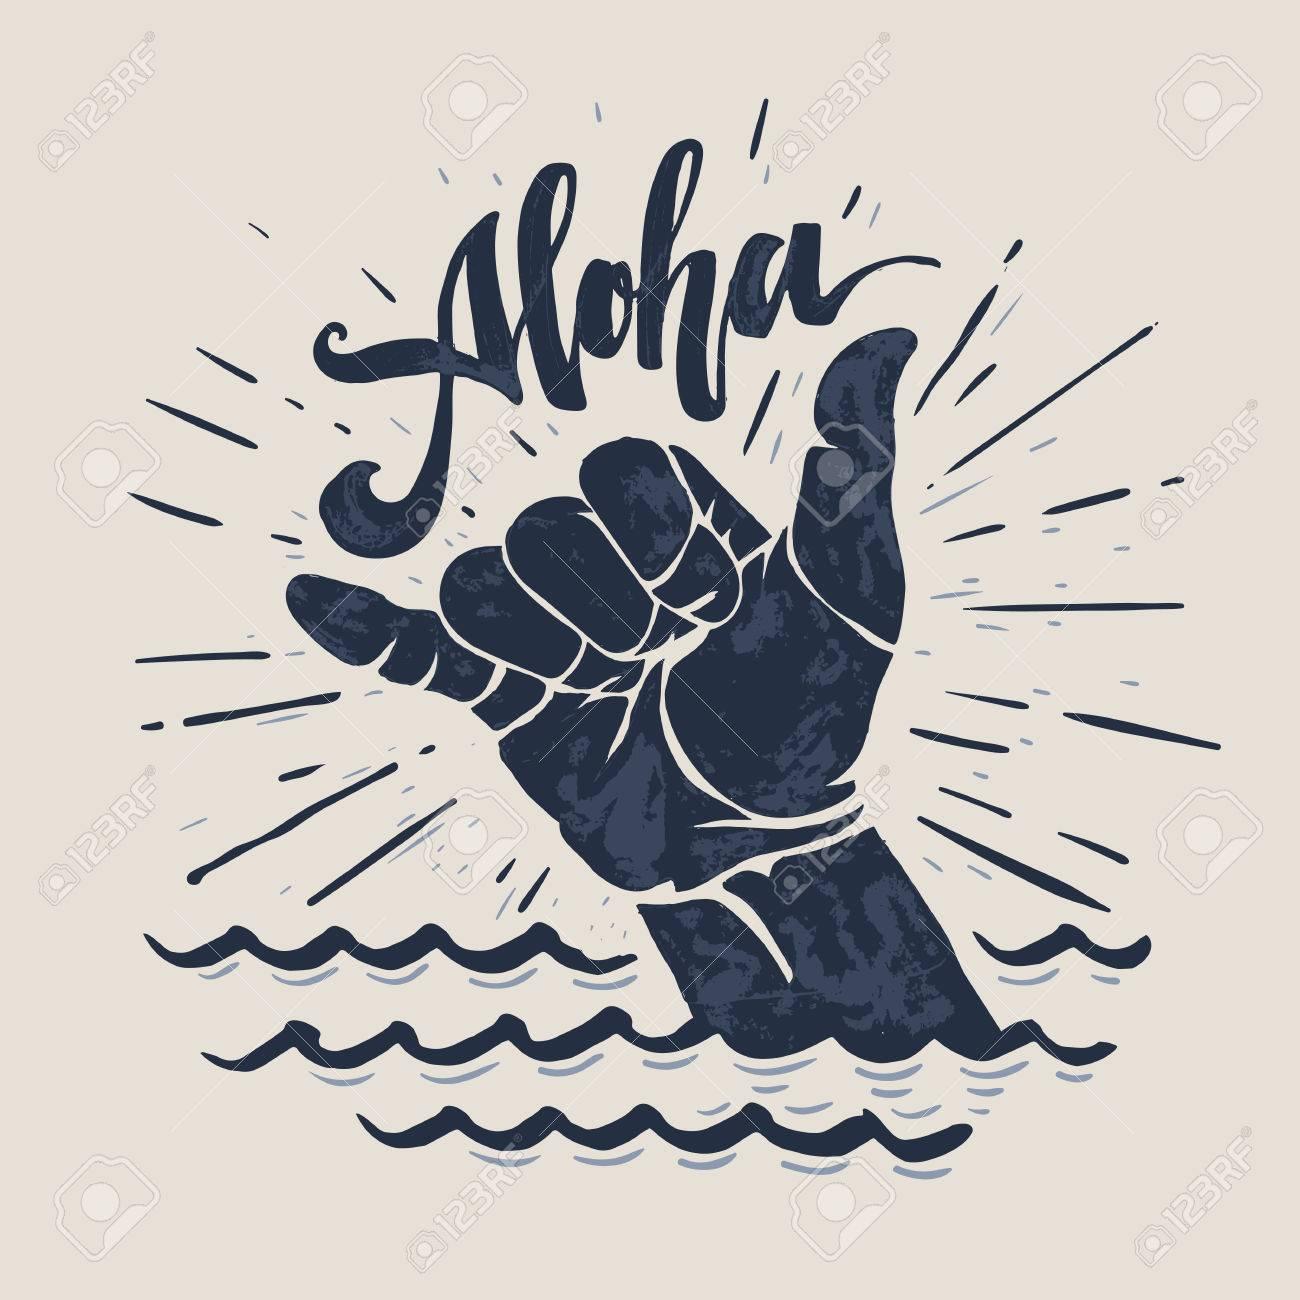 Surf hand sign. - 75344136